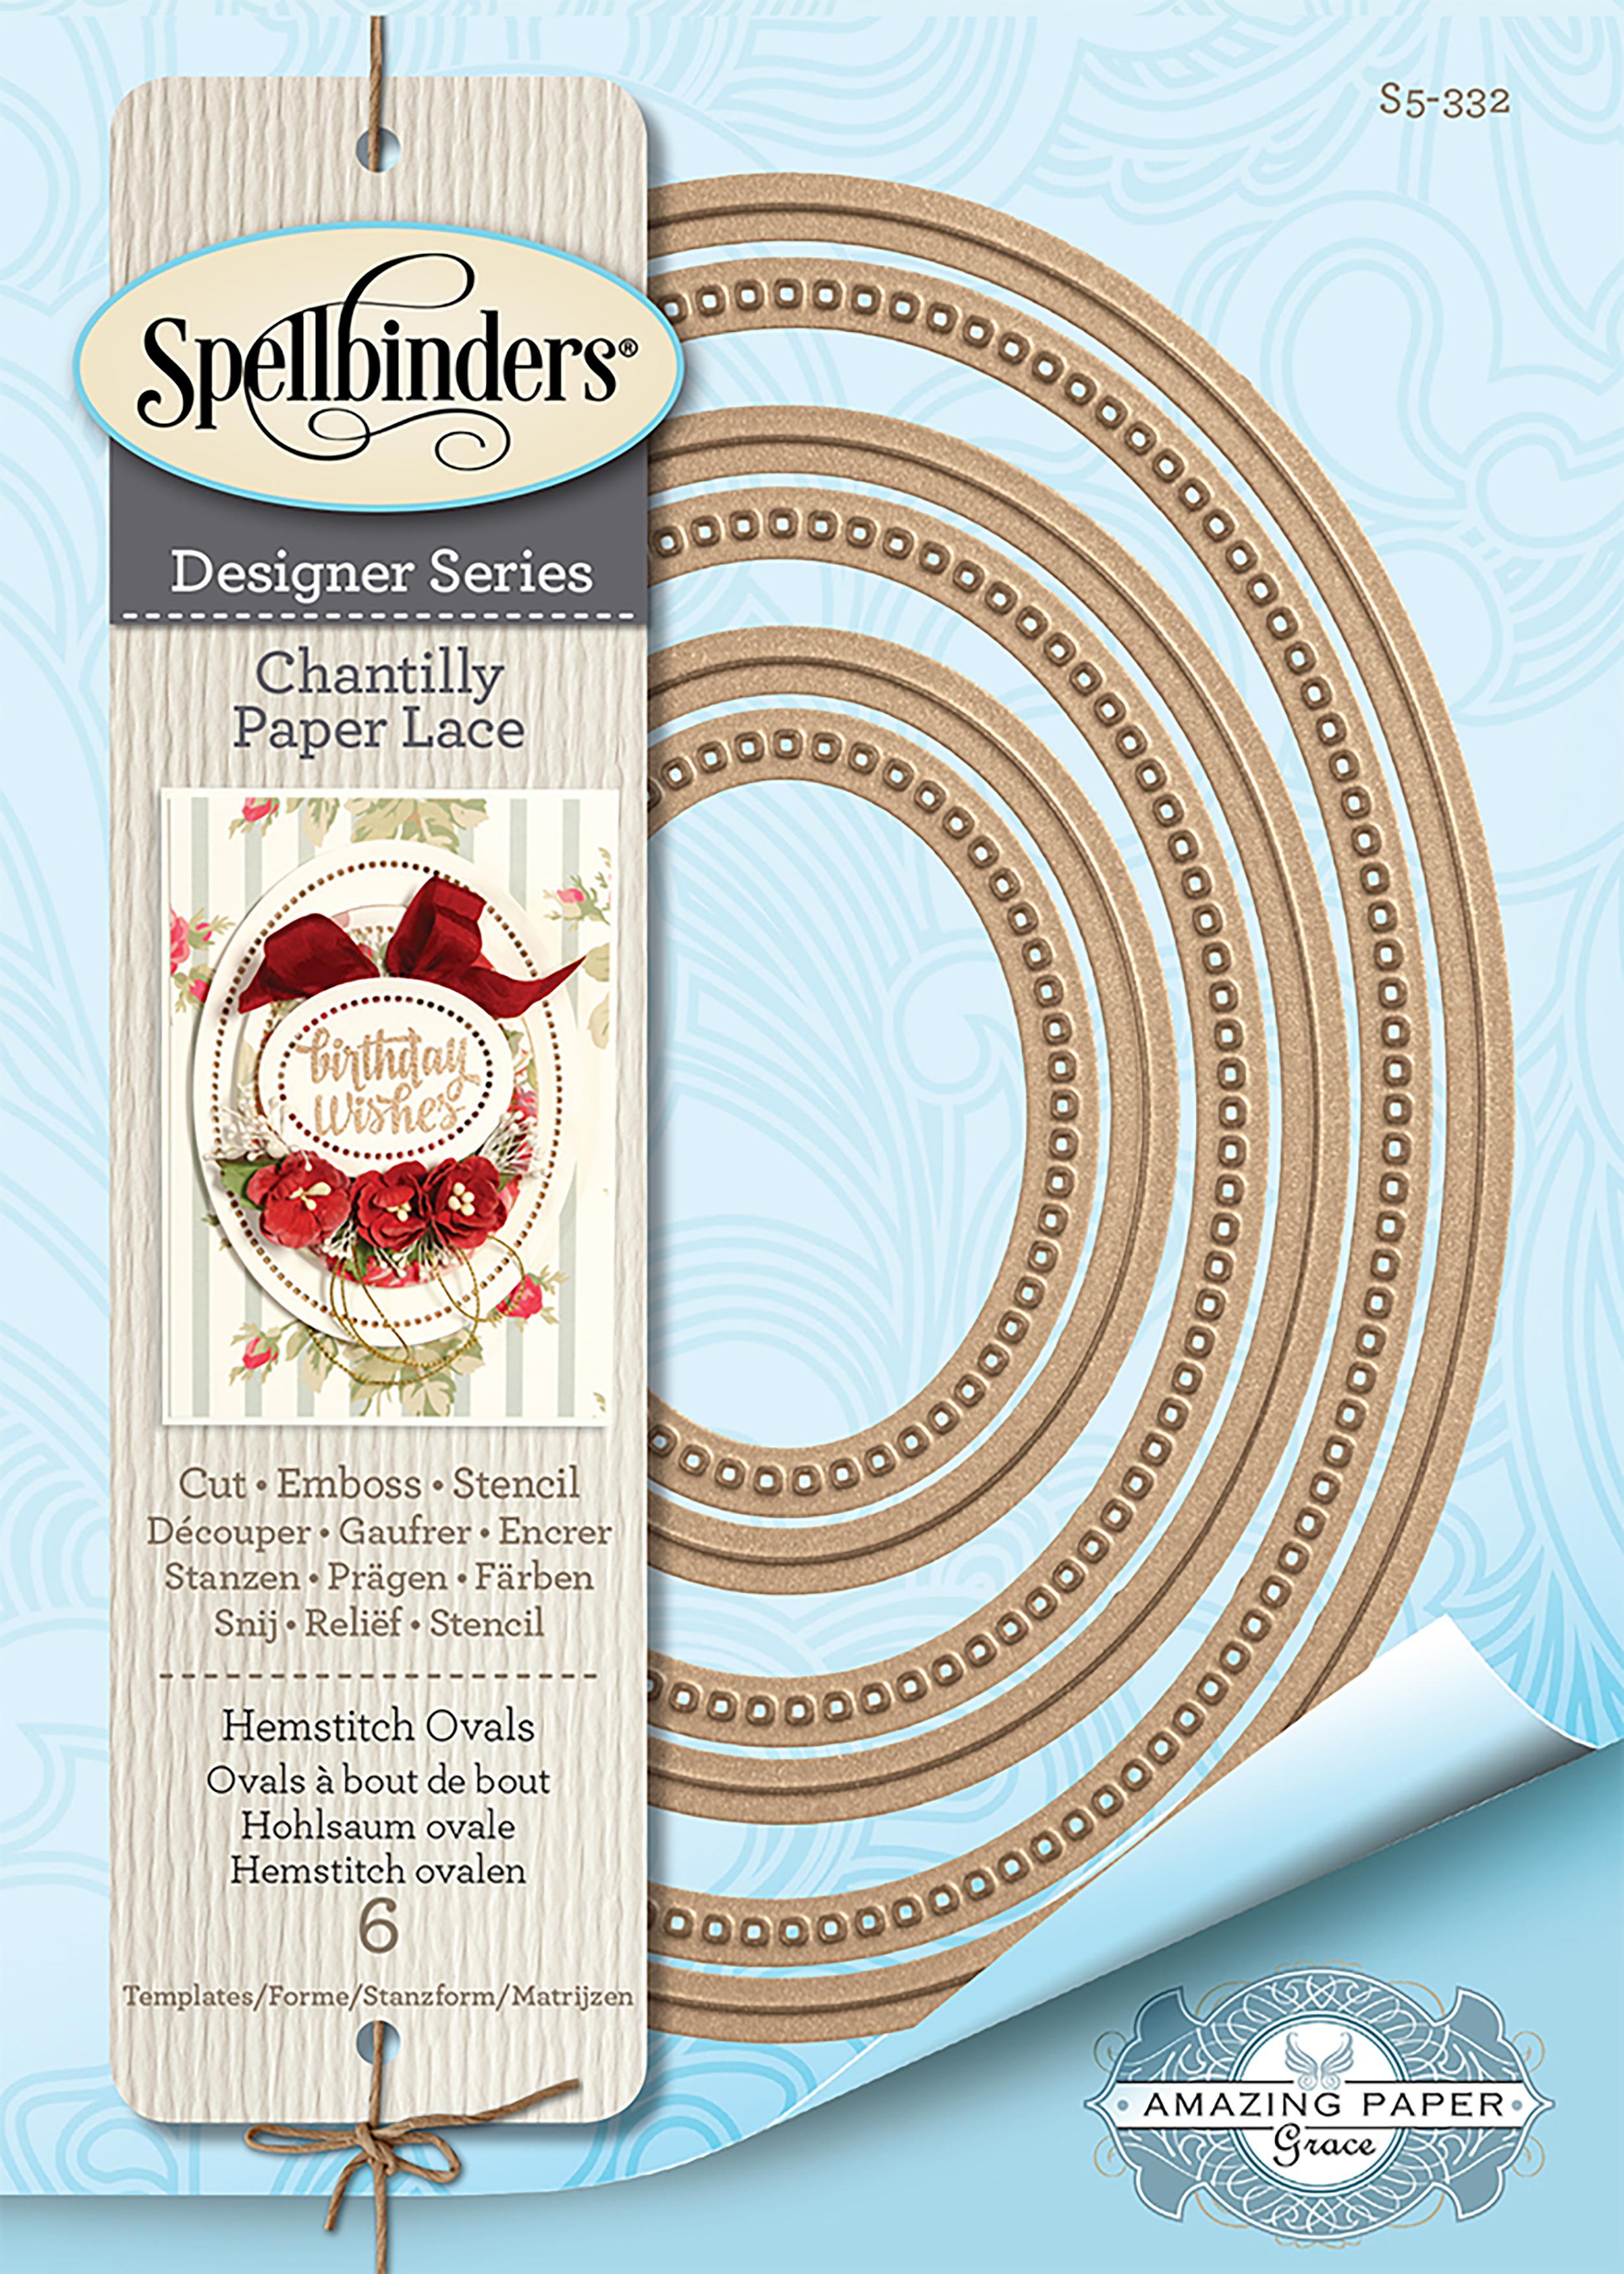 Spellbinders Chantilly Paper Lace By Becca Feeken-Hemstitch Ovals 1.75 to 5.5